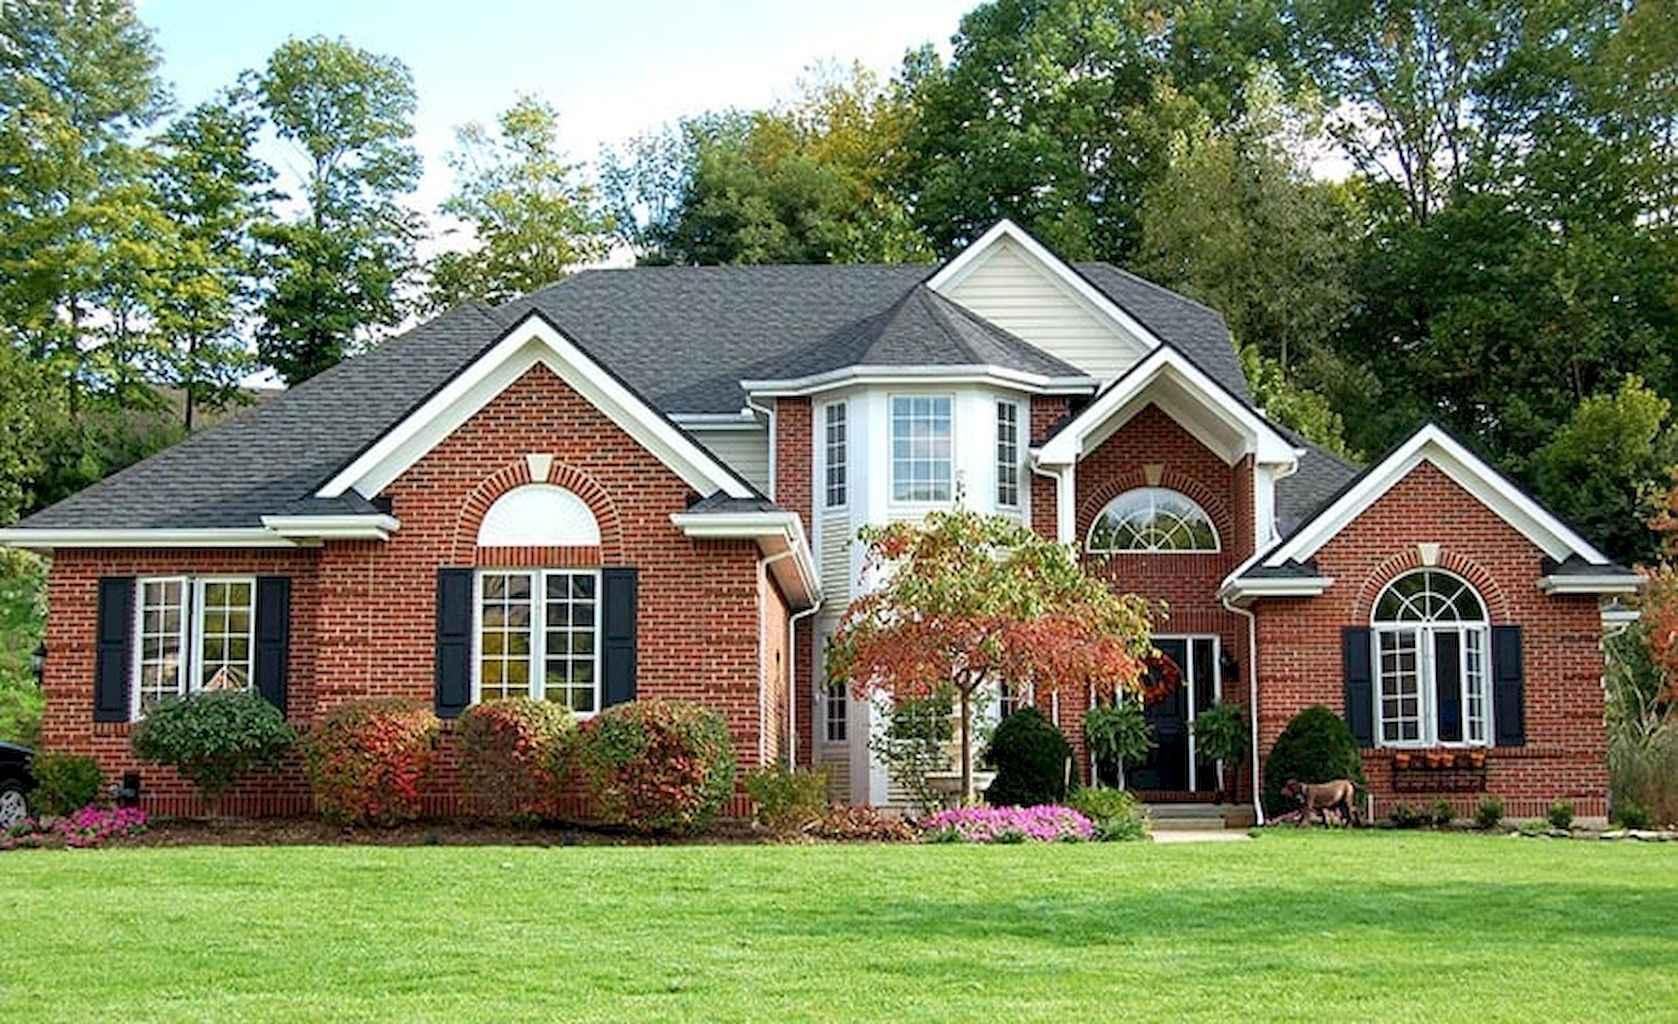 80 awesome plantation homes farmhouse design ideas (53)